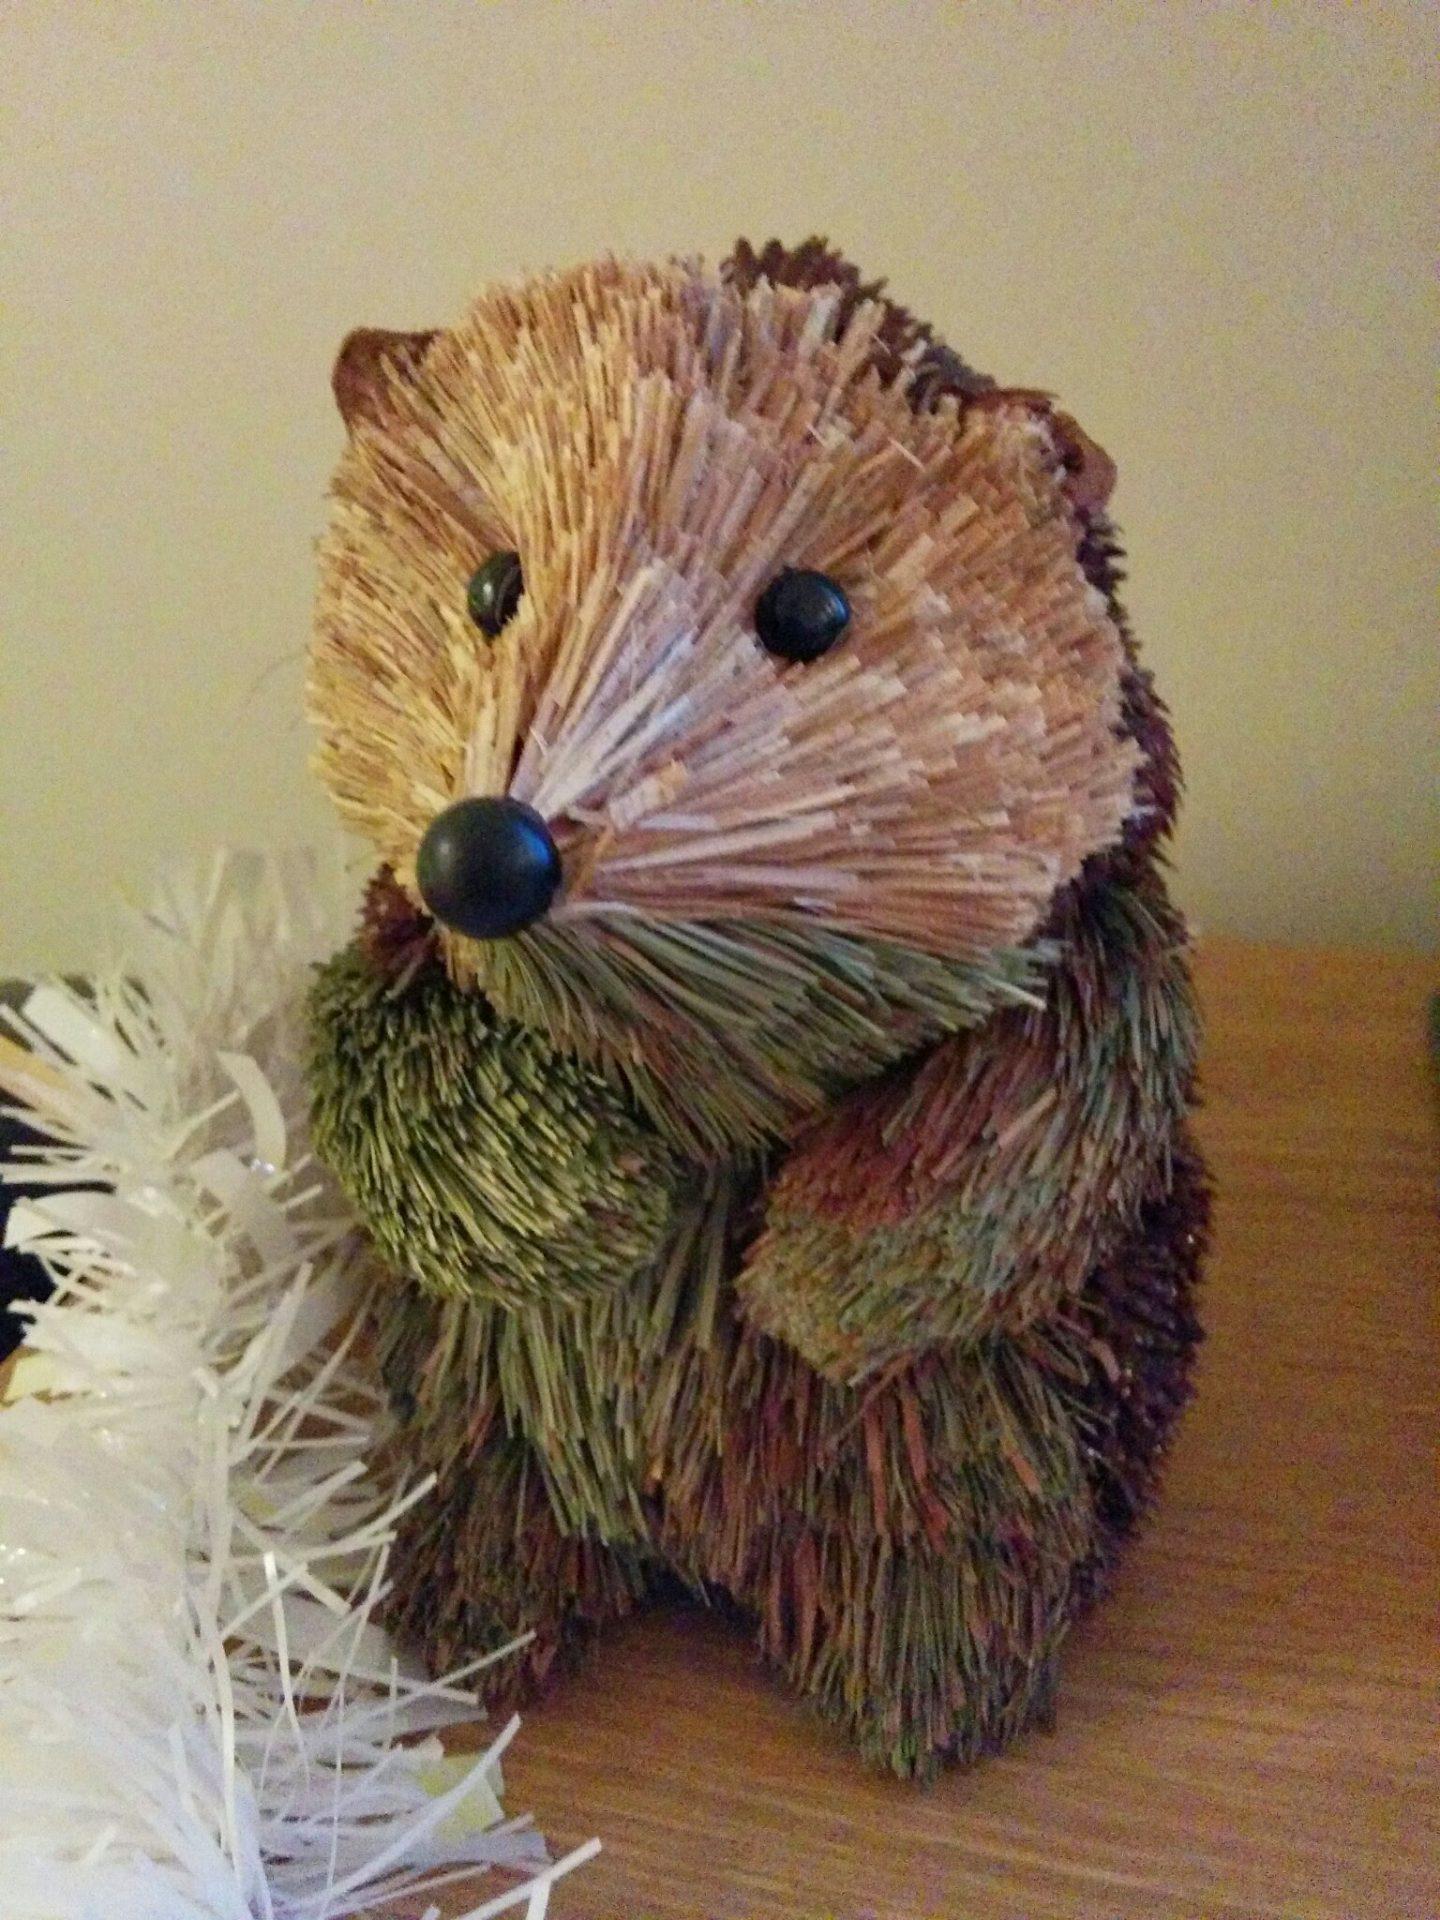 Christmas hedgehog from Homebase